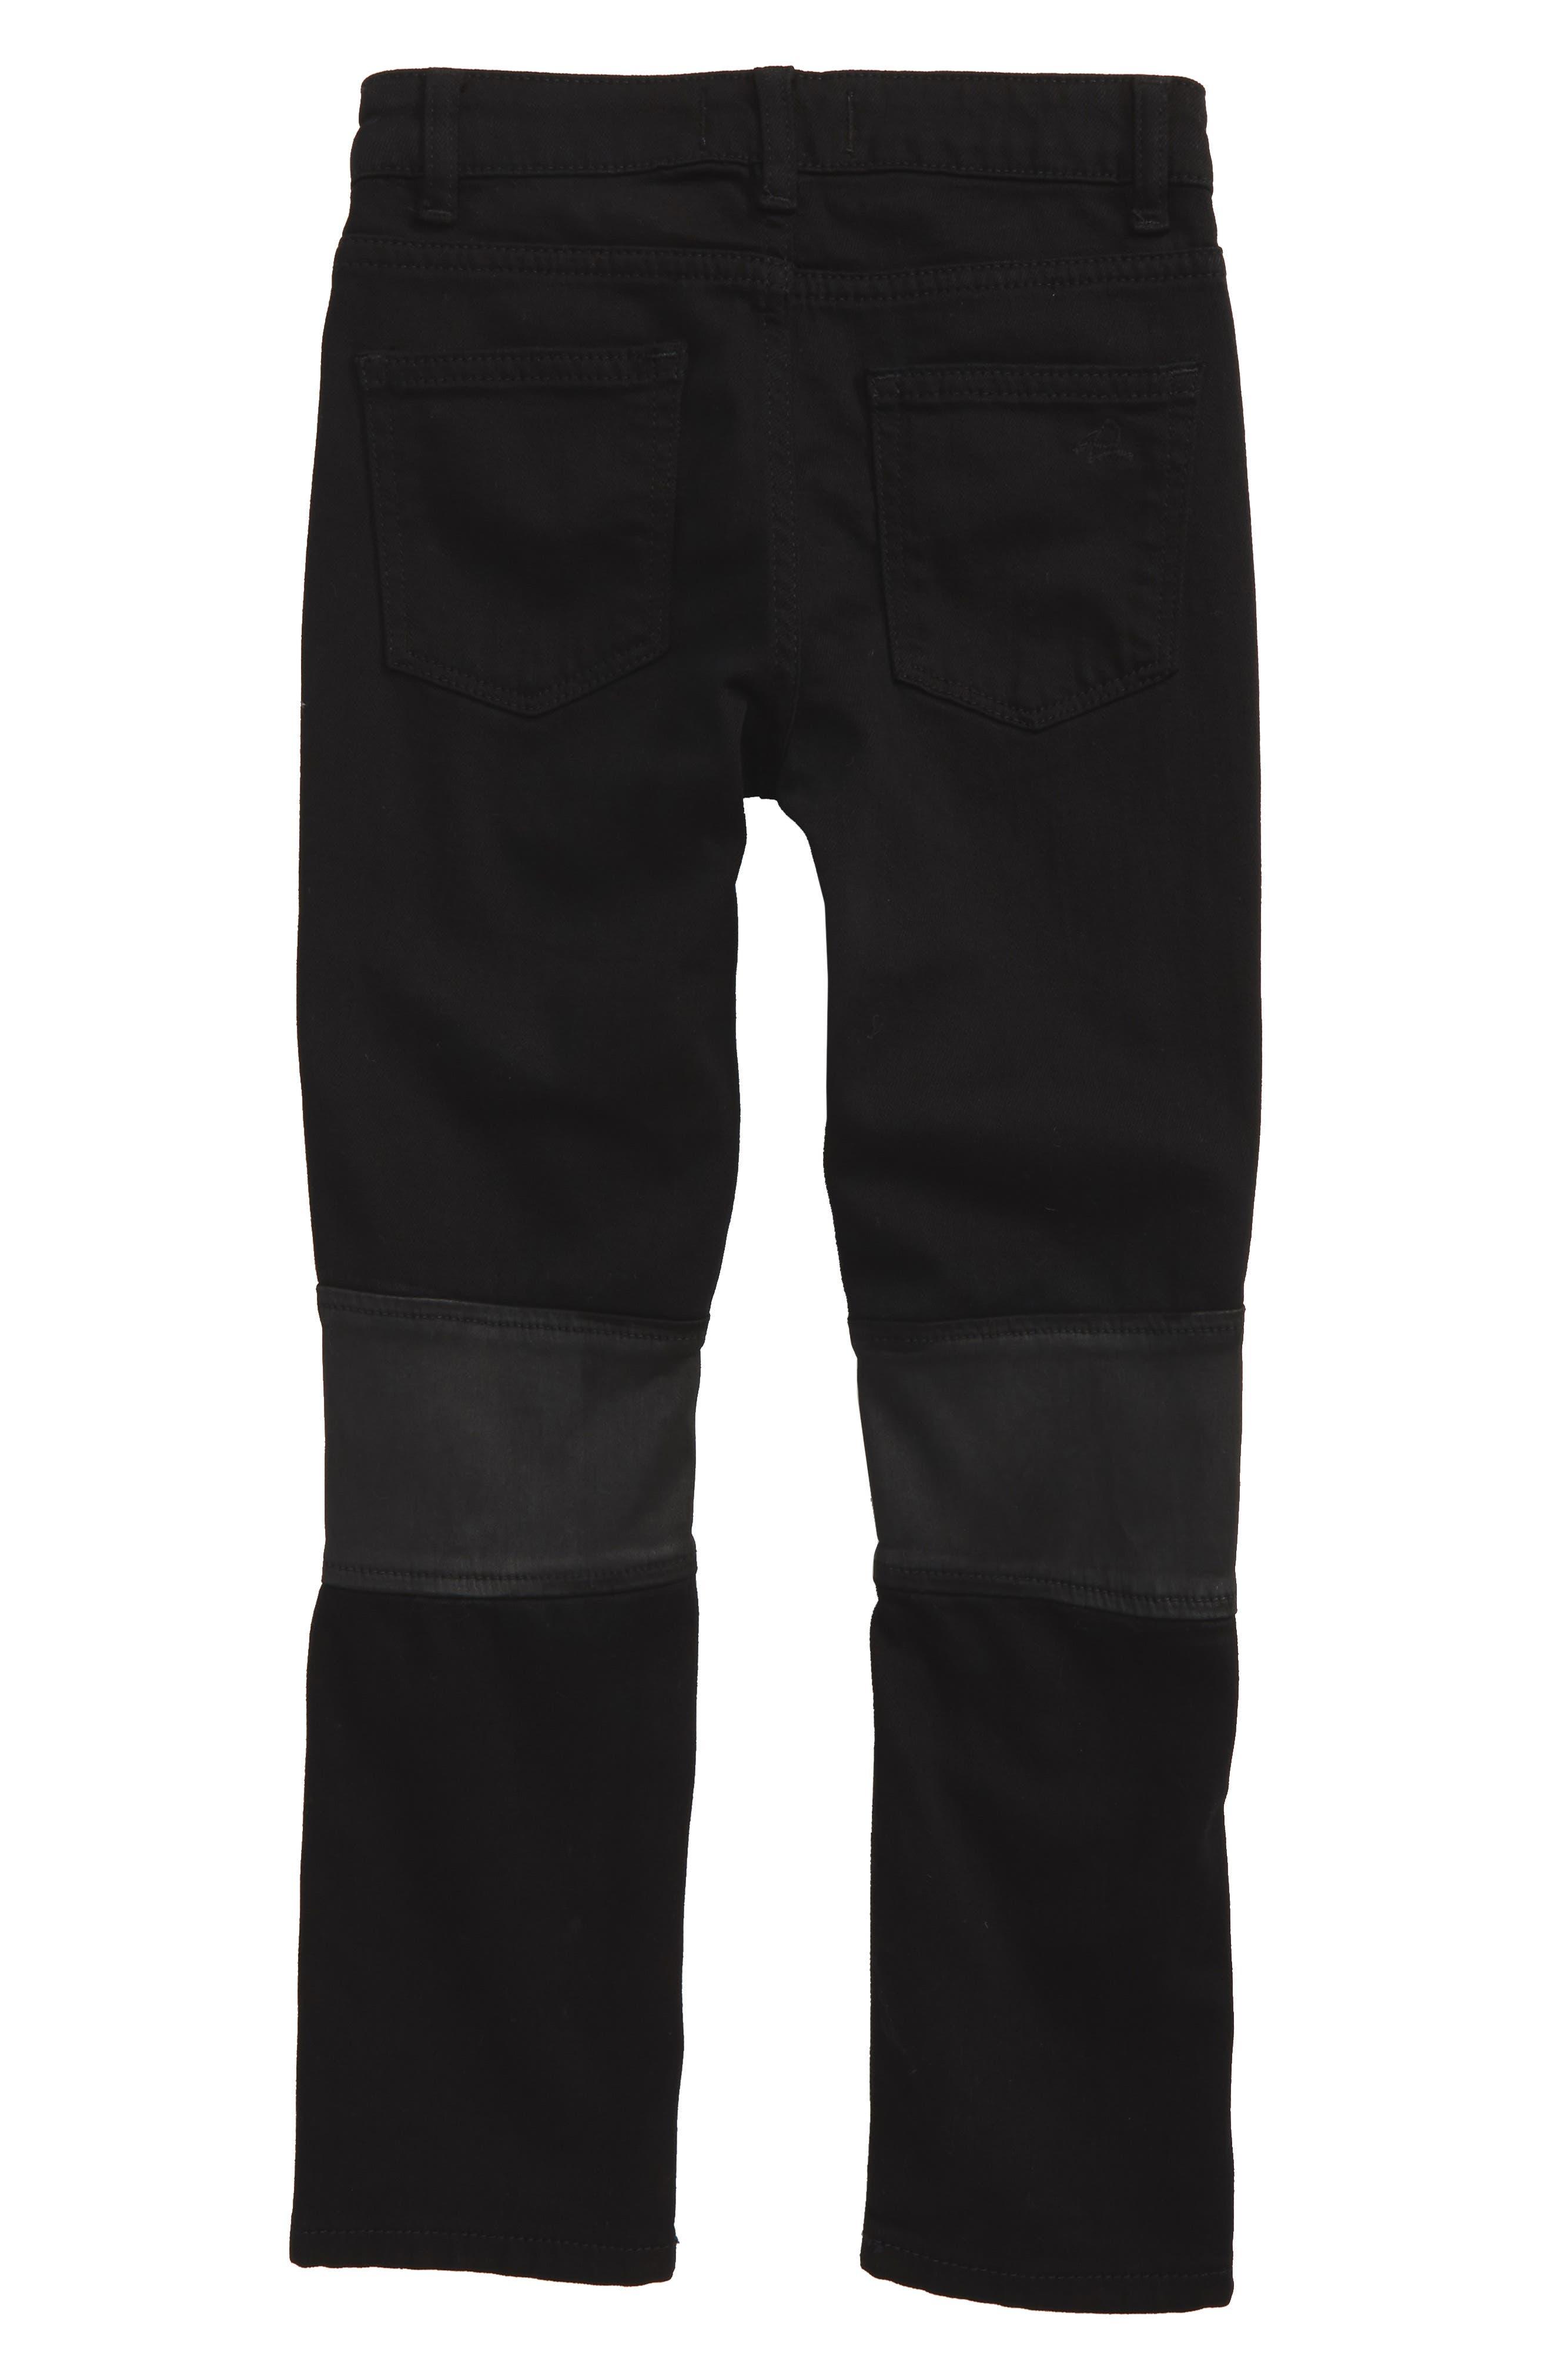 Hawke Skinny Moto Jeans,                             Alternate thumbnail 2, color,                             Wheel